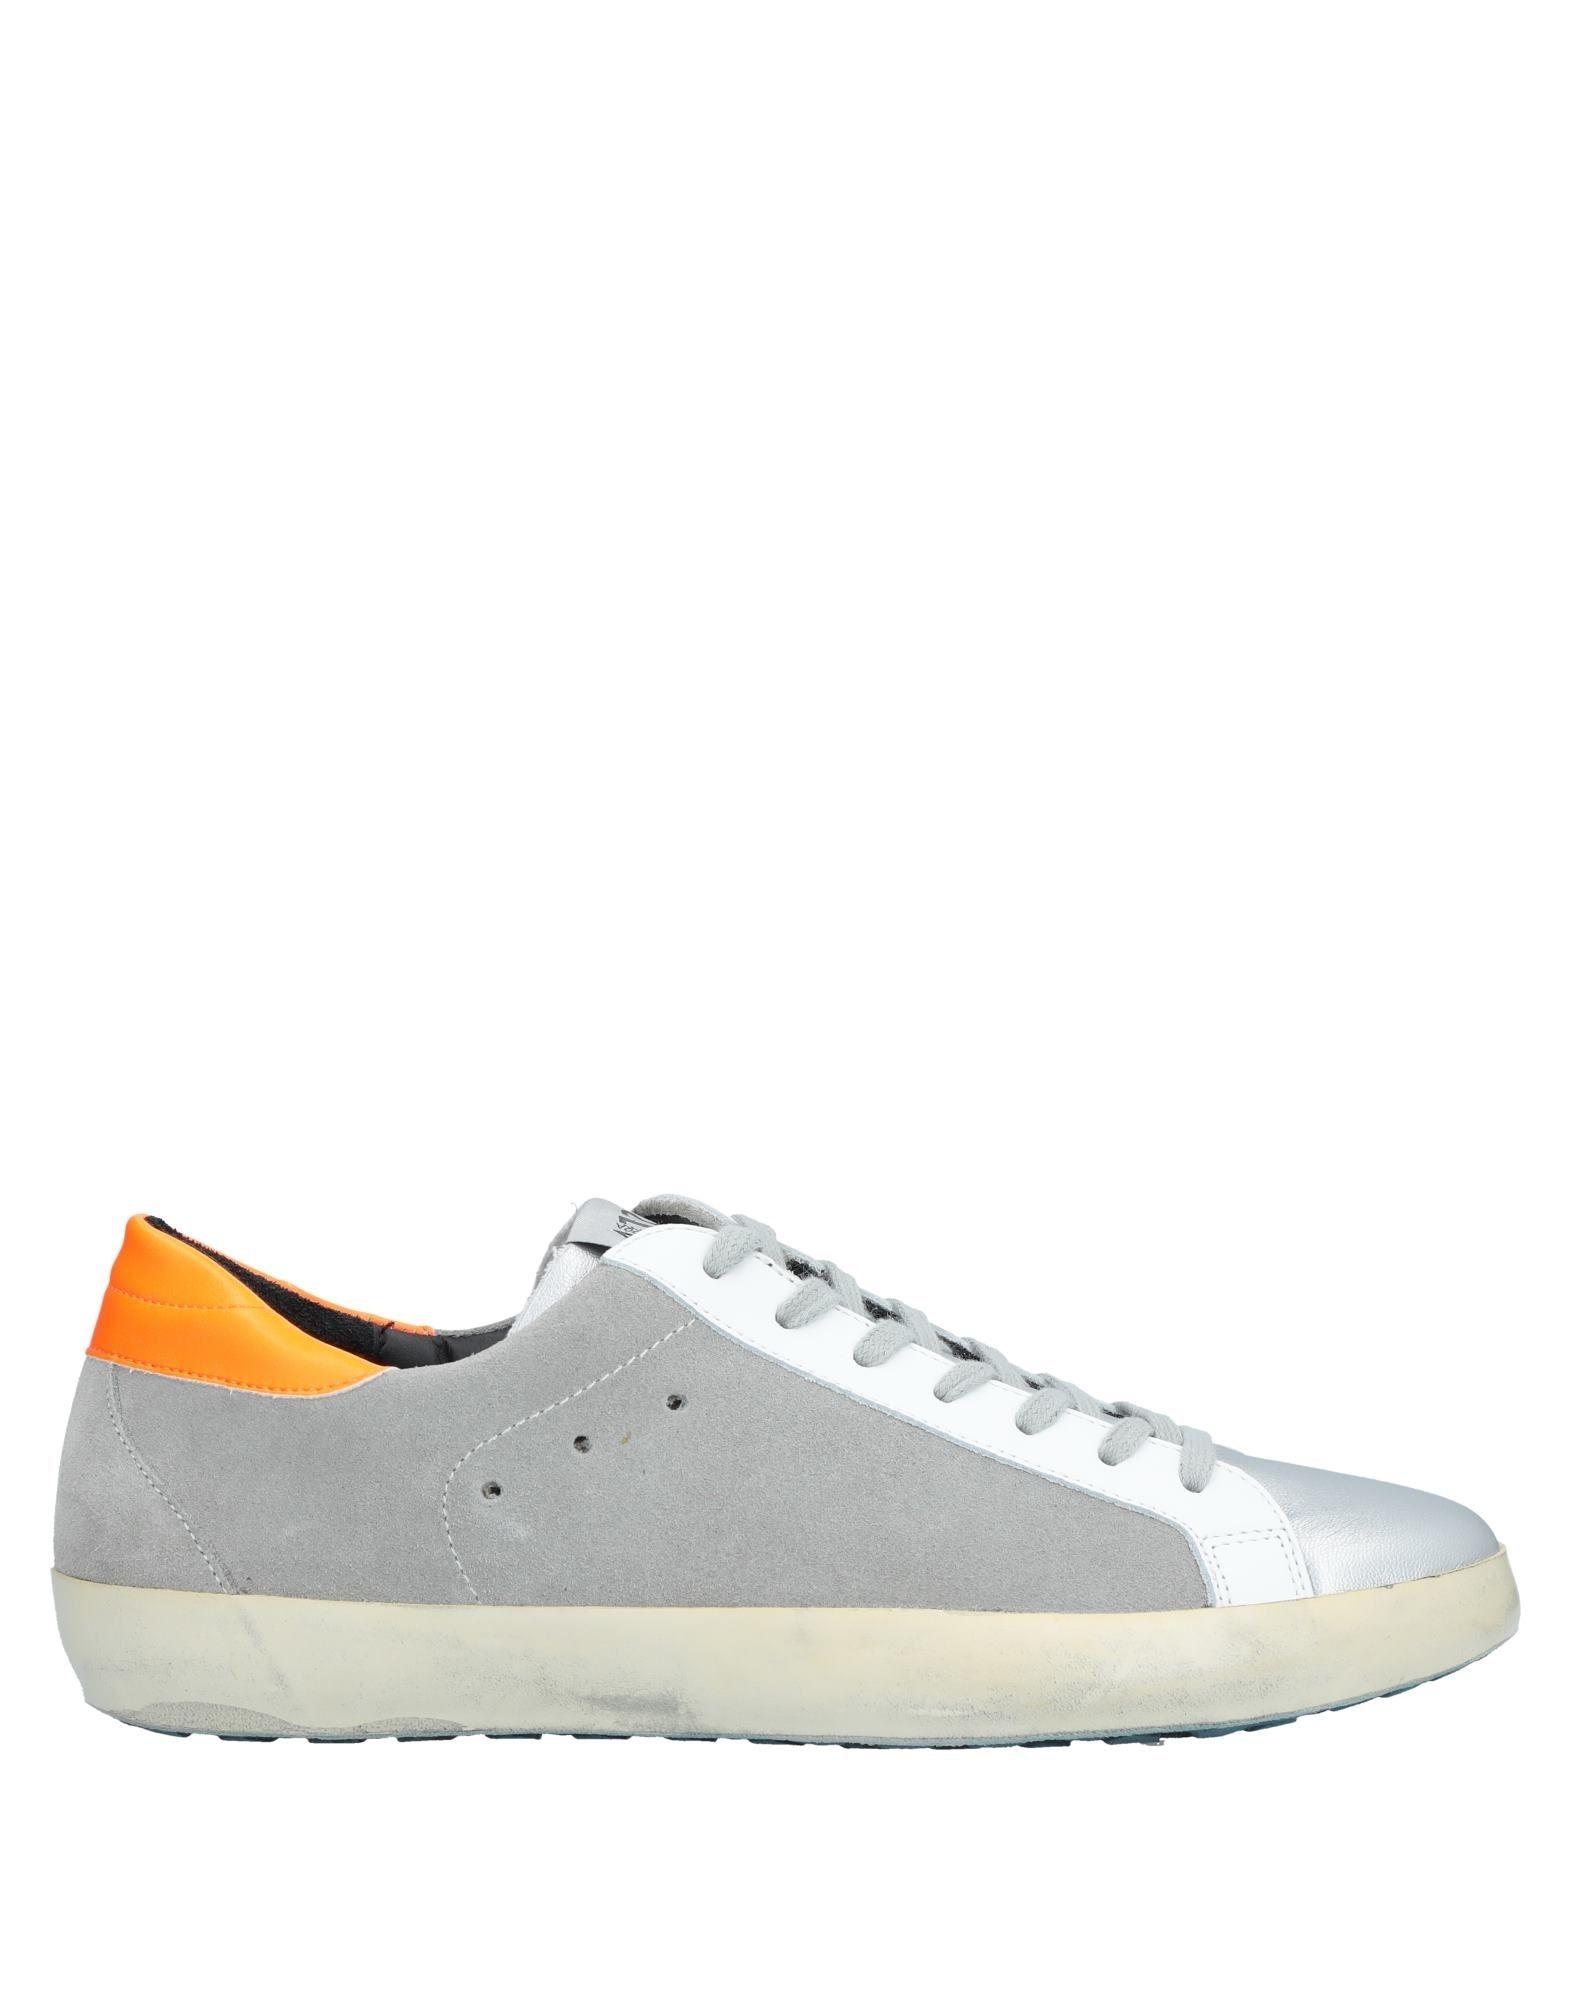 Moda Sneakers Sneakers Moda Quattrobarradodici Uomo - 11538180VB dc1541